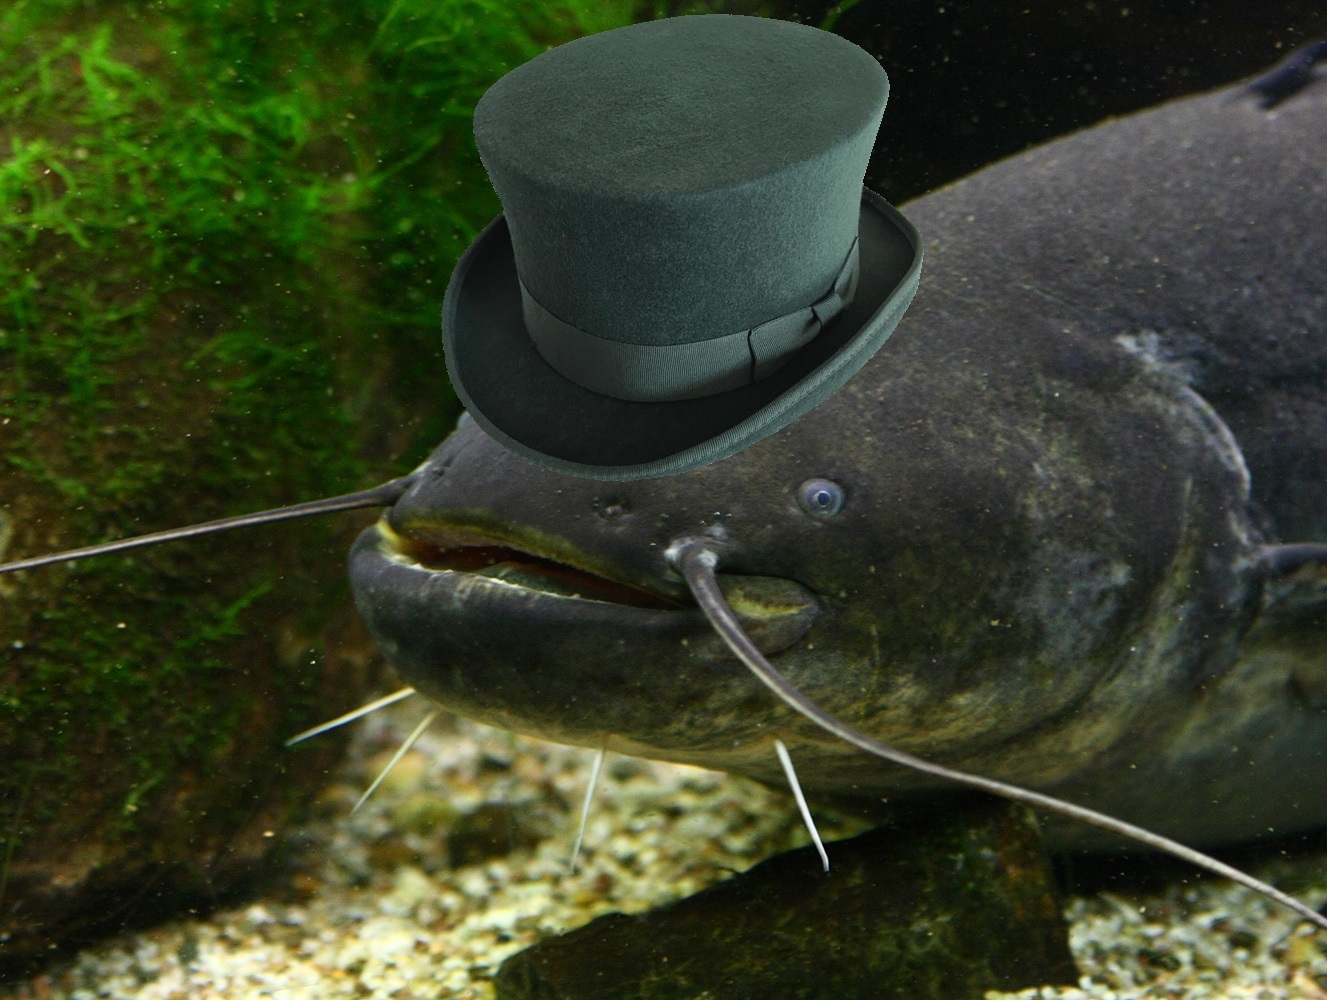 Sticker jvc silure gentleman poisson chapeau lac fleuve riviere marais